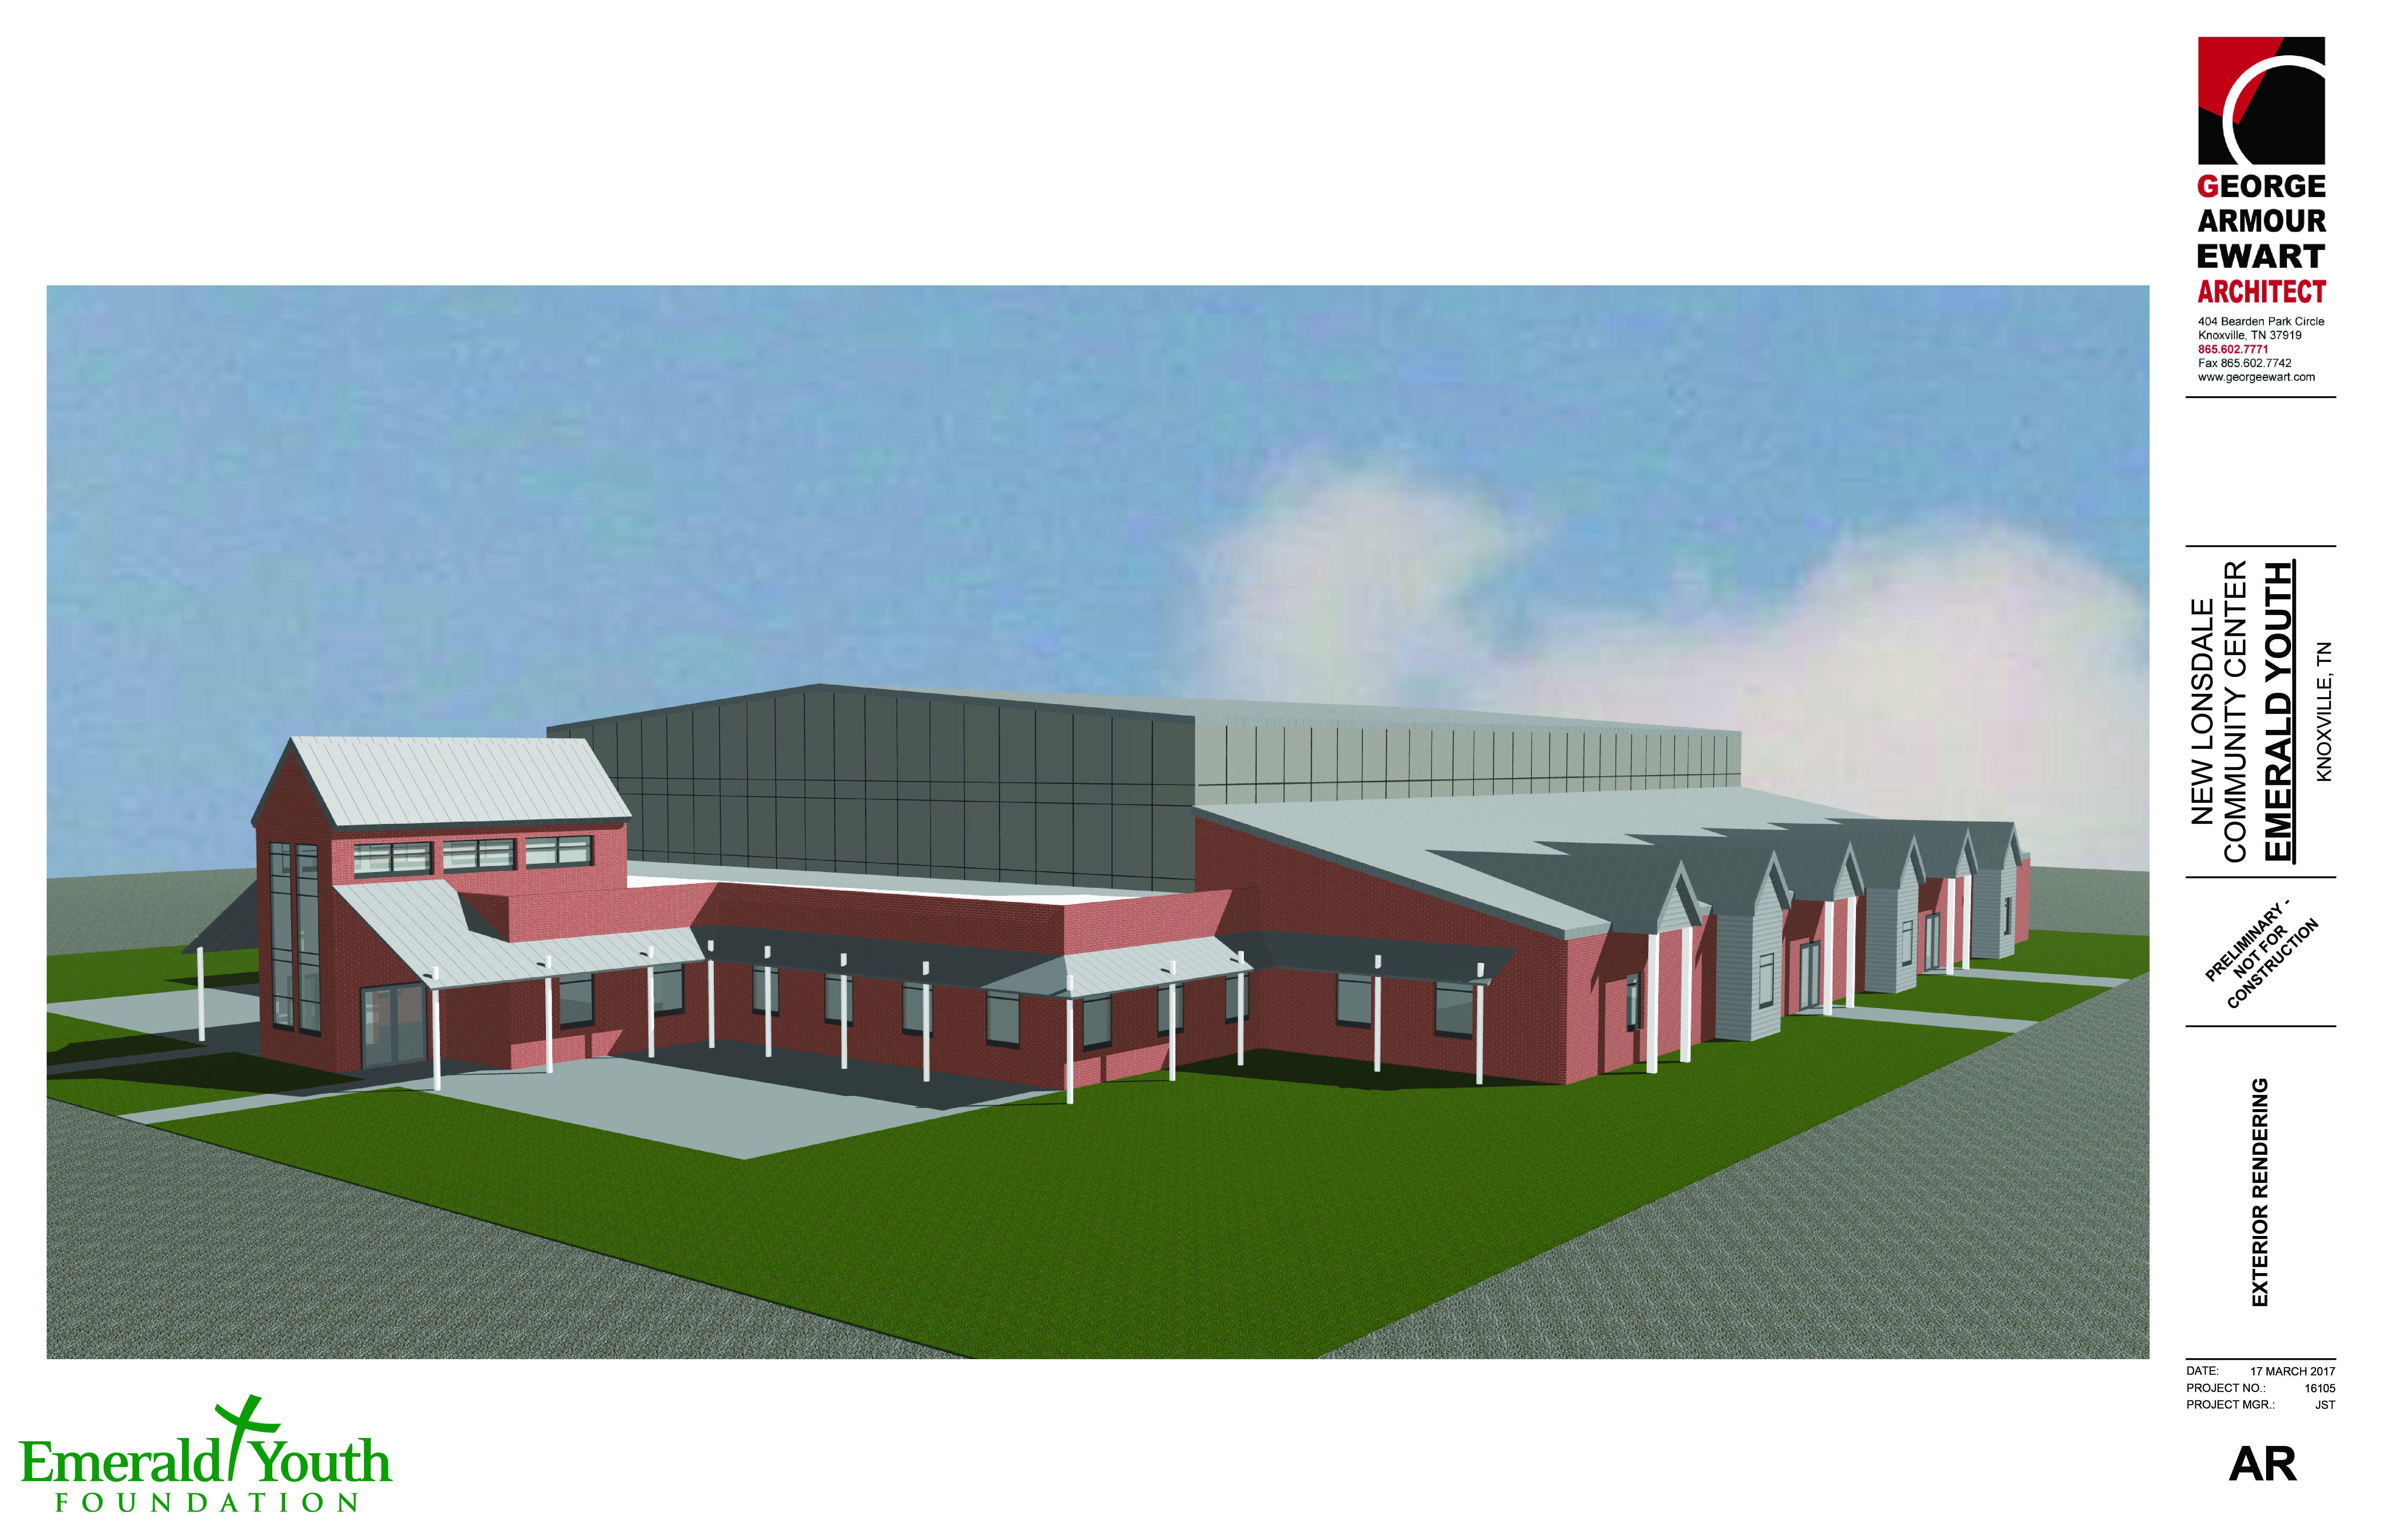 Knox school board expresses concern over